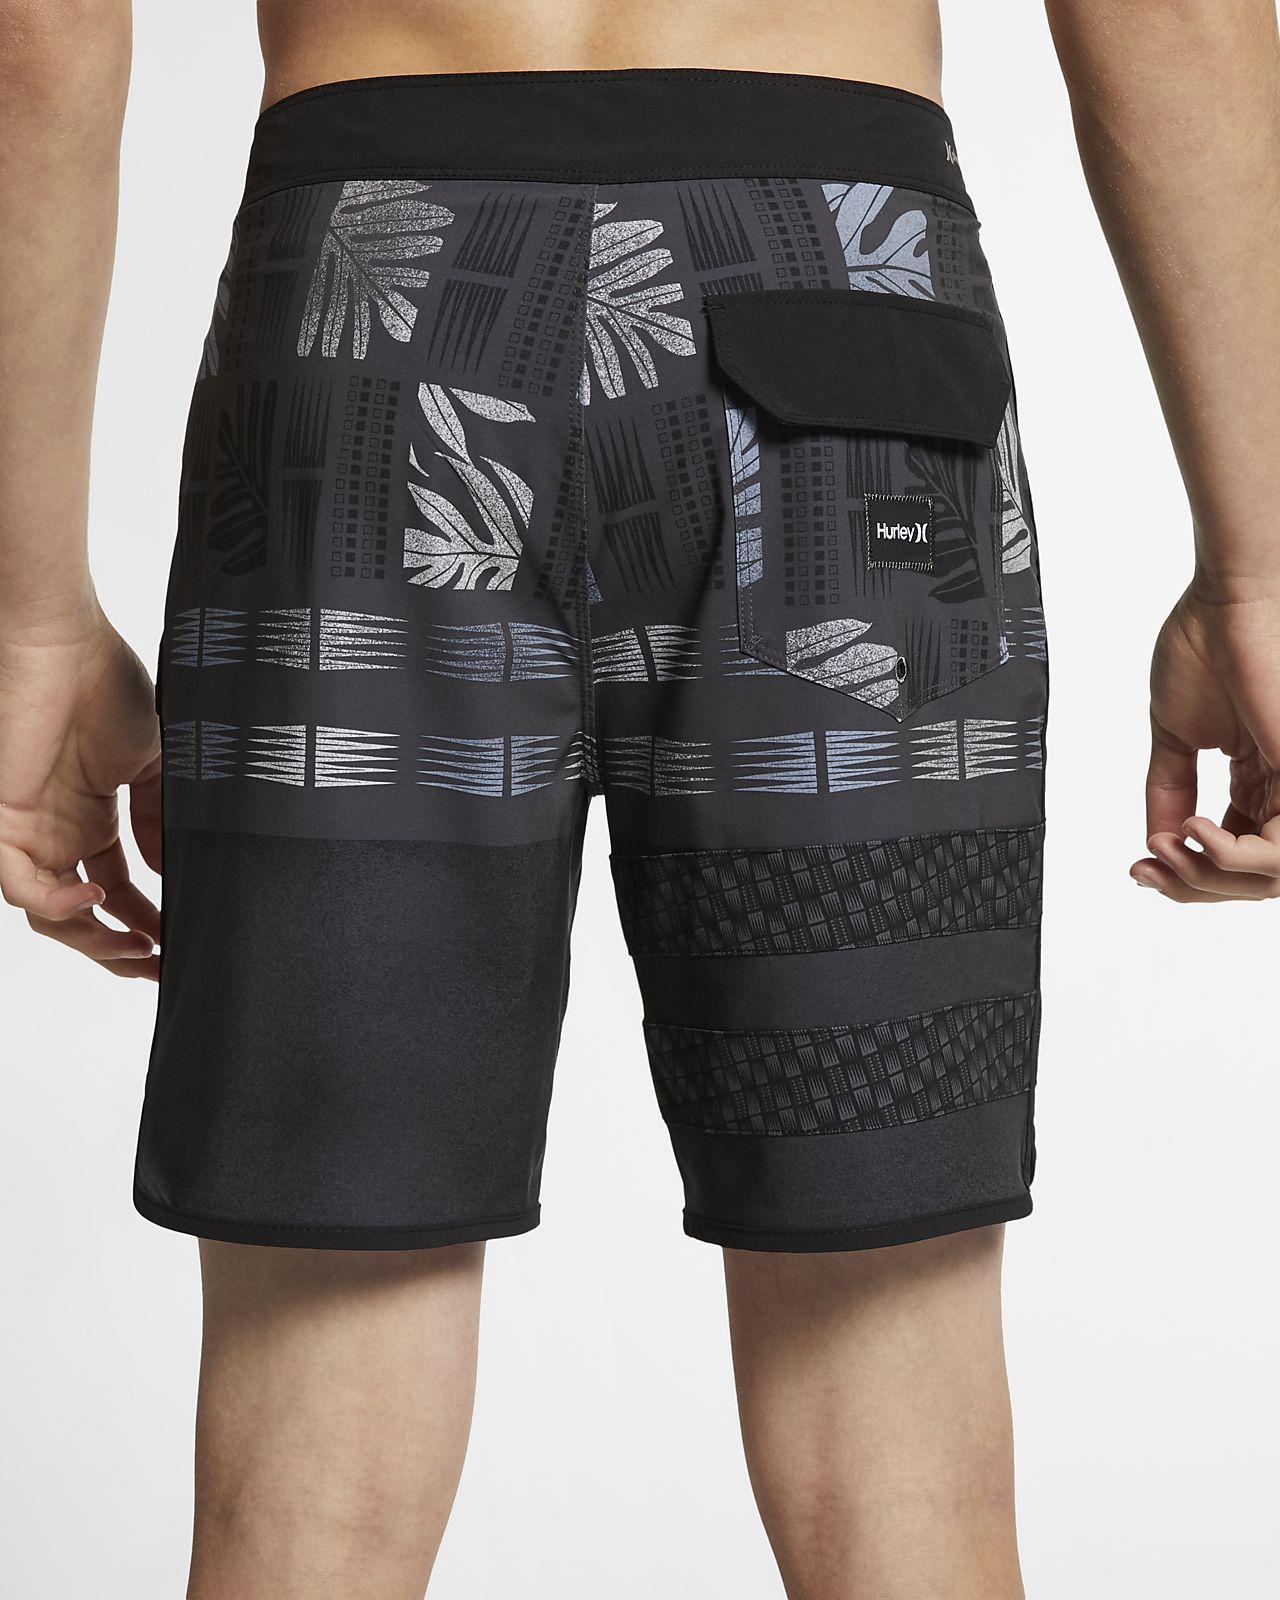 7e37426633 Hurley Phantom Sig Zane Maloulu Men's 46cm approx. Boardshorts. Nike ...